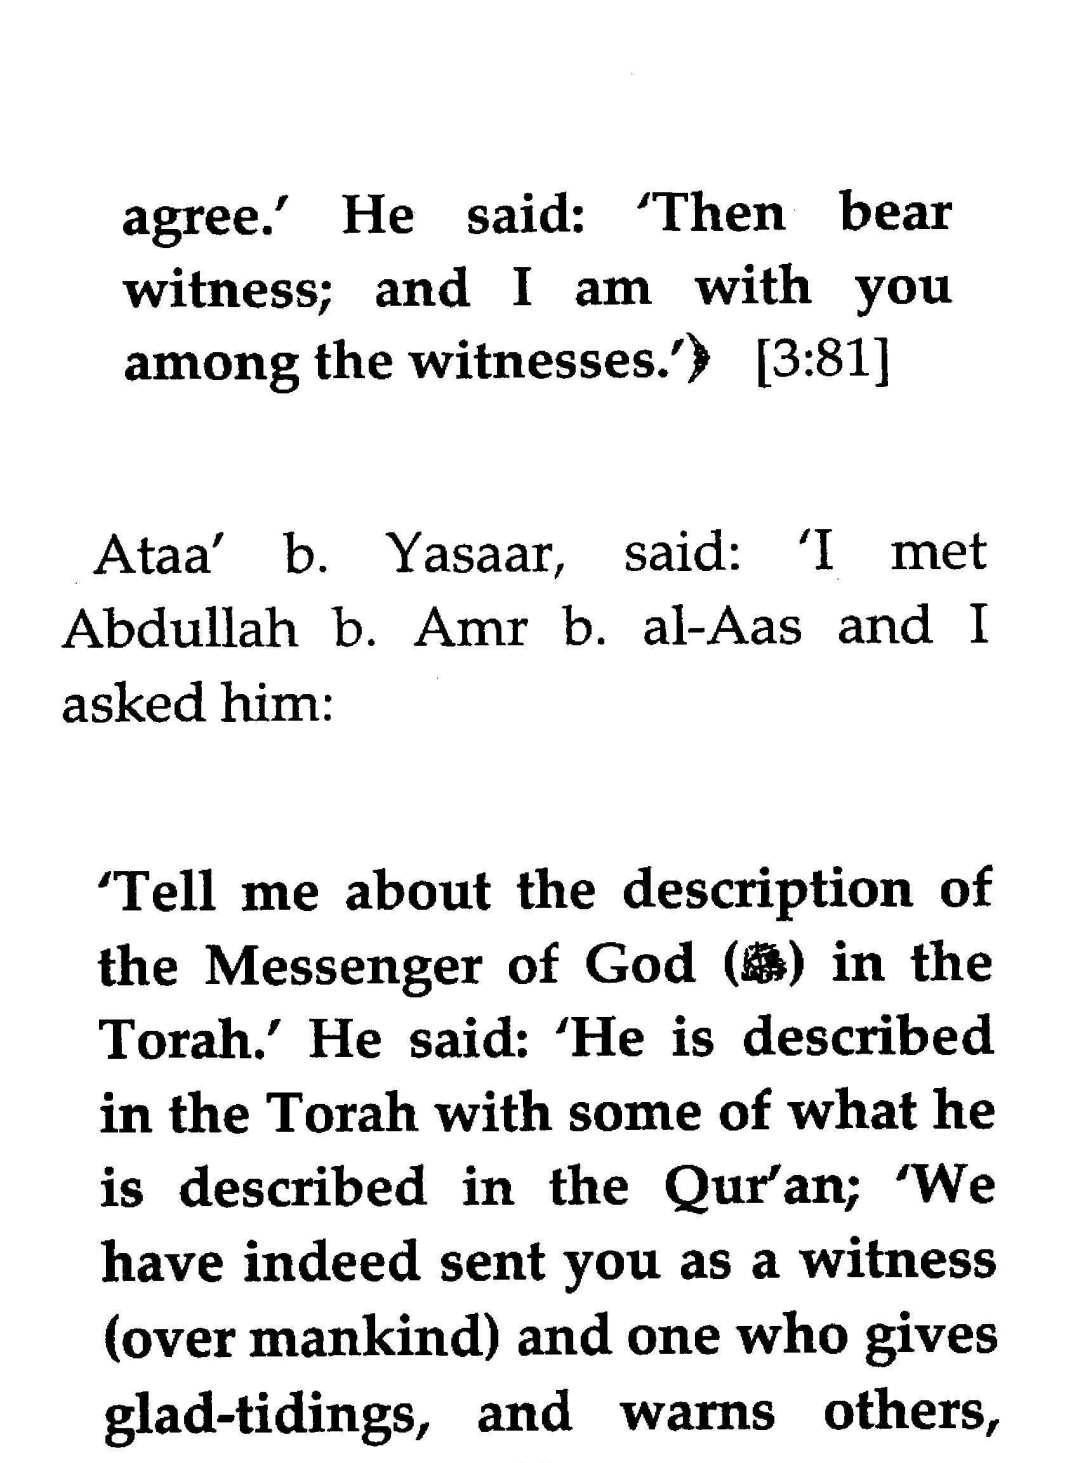 MuhammadpeaceBeUponHimInTheTorahAndGospel_Page_14